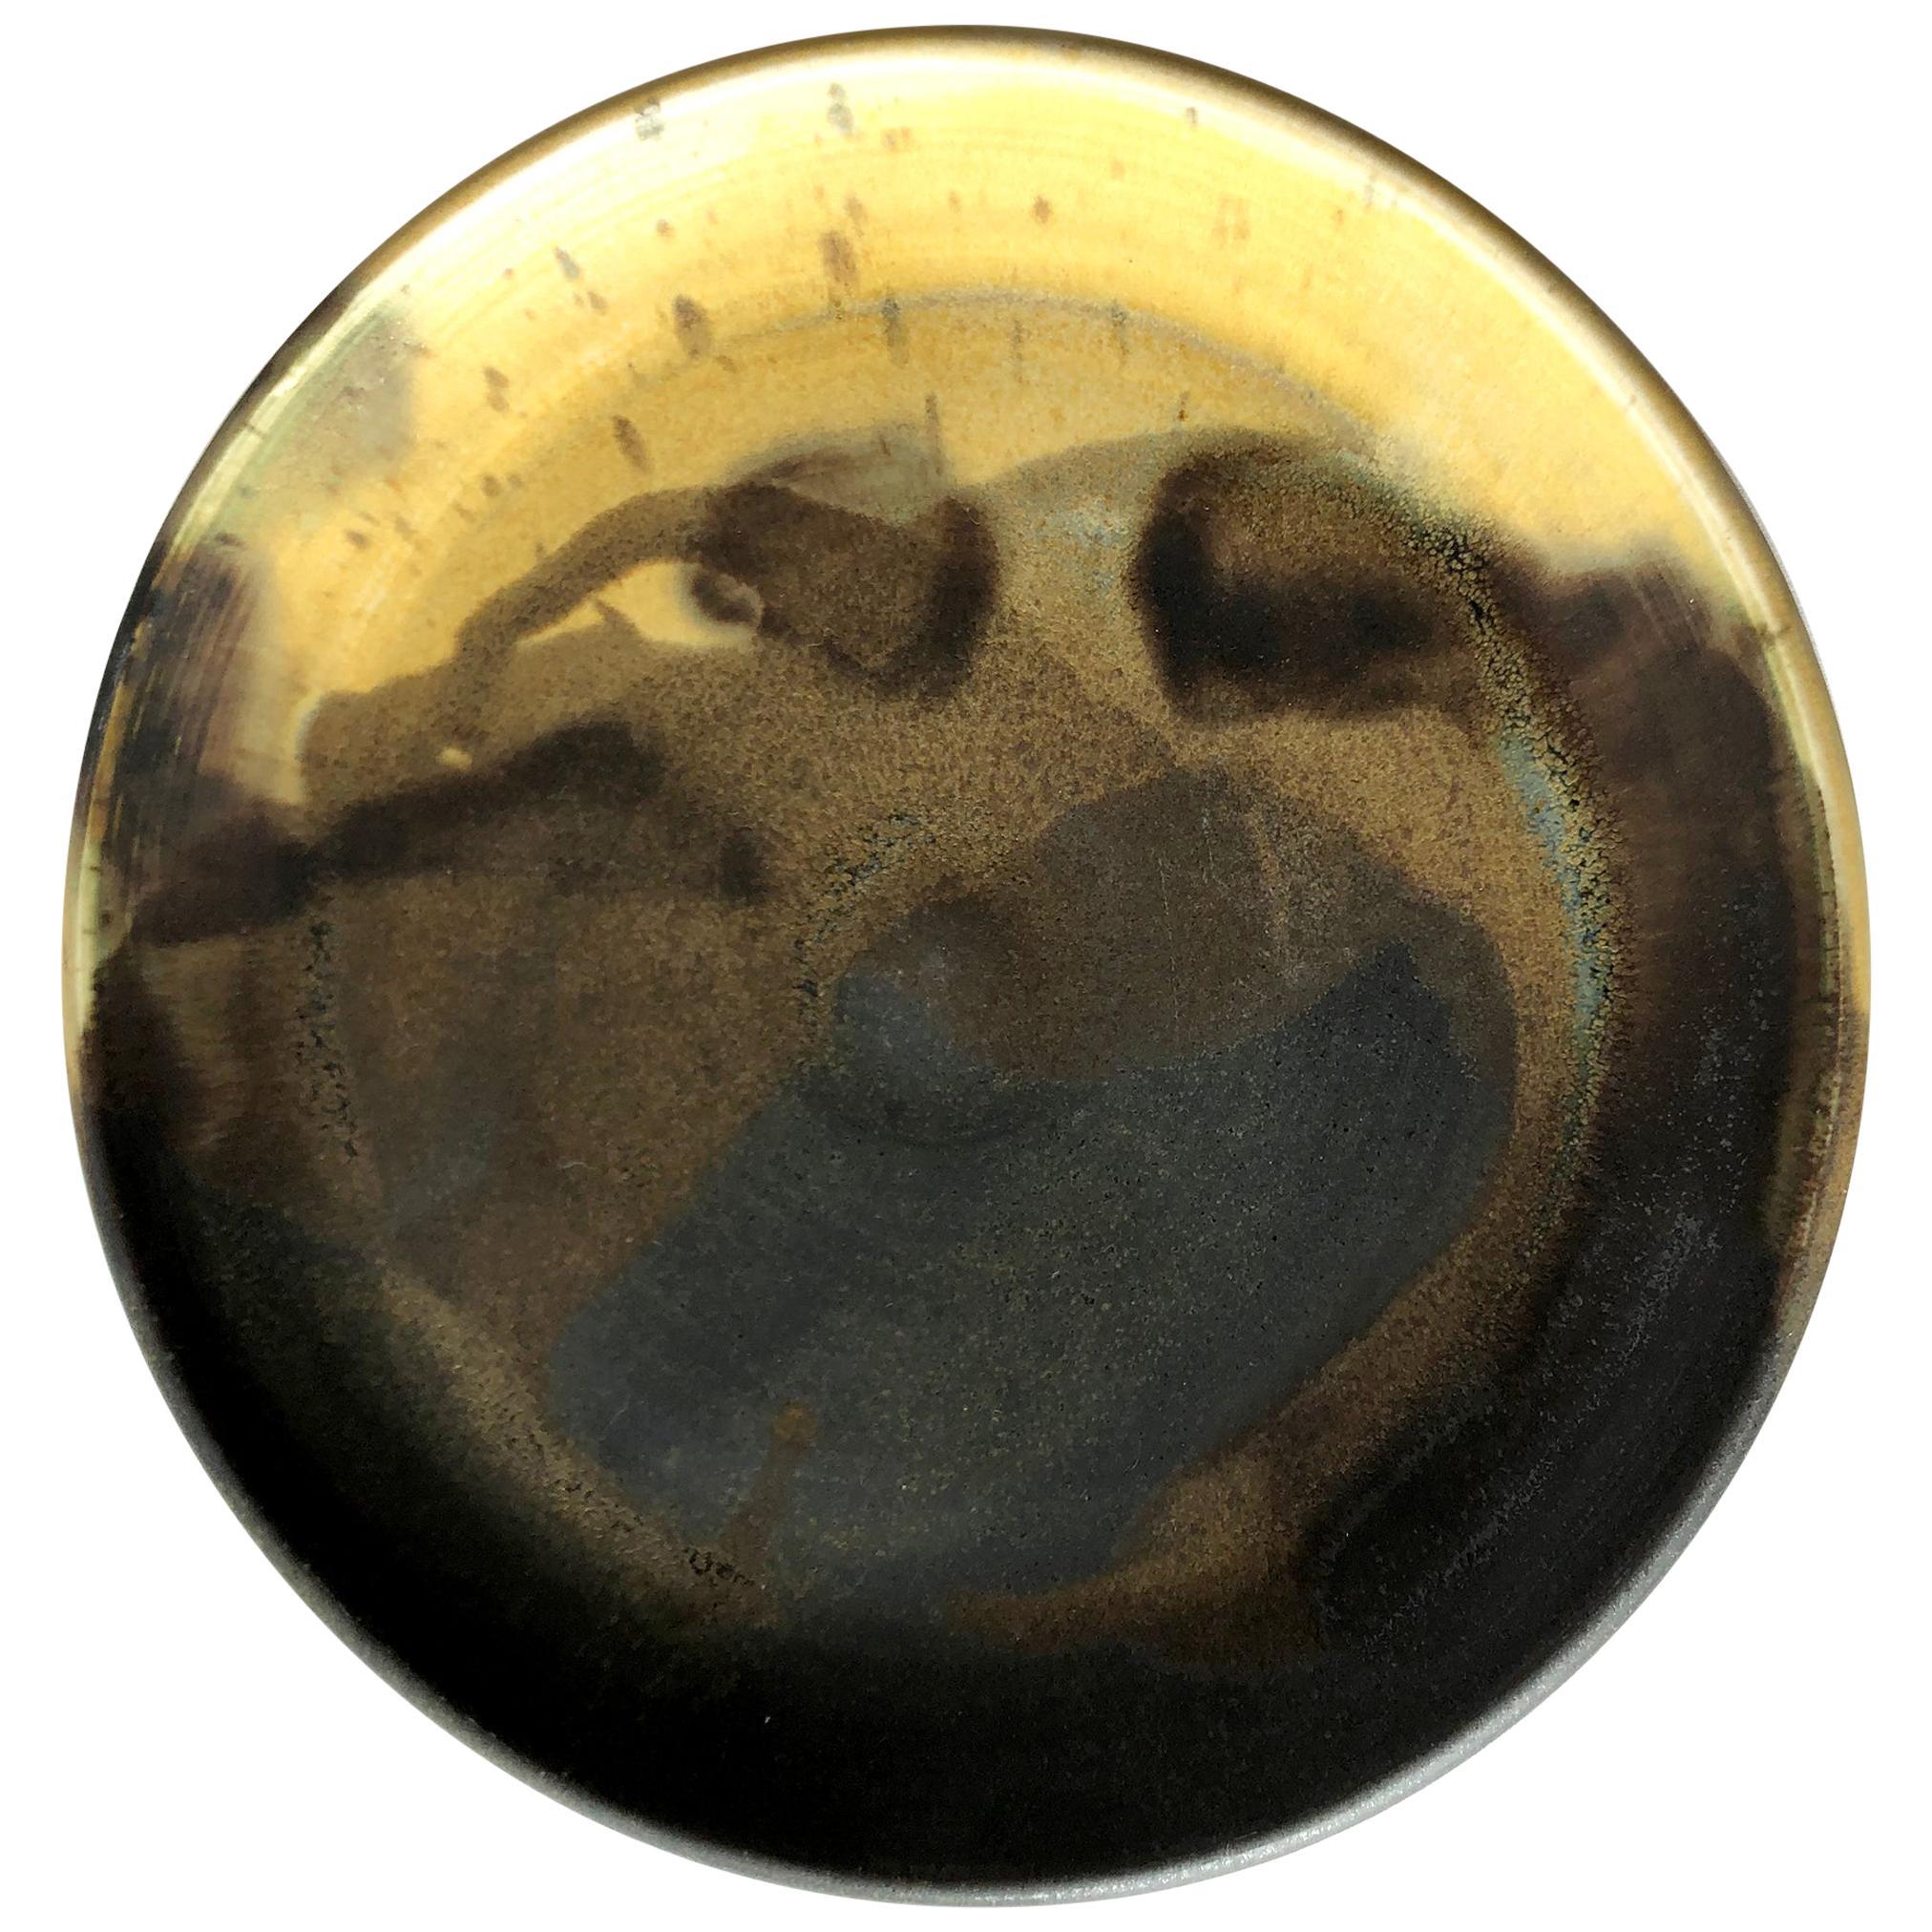 Toshiko Takaezu Stoneware Splash Abstract Glazed Pottery Plate